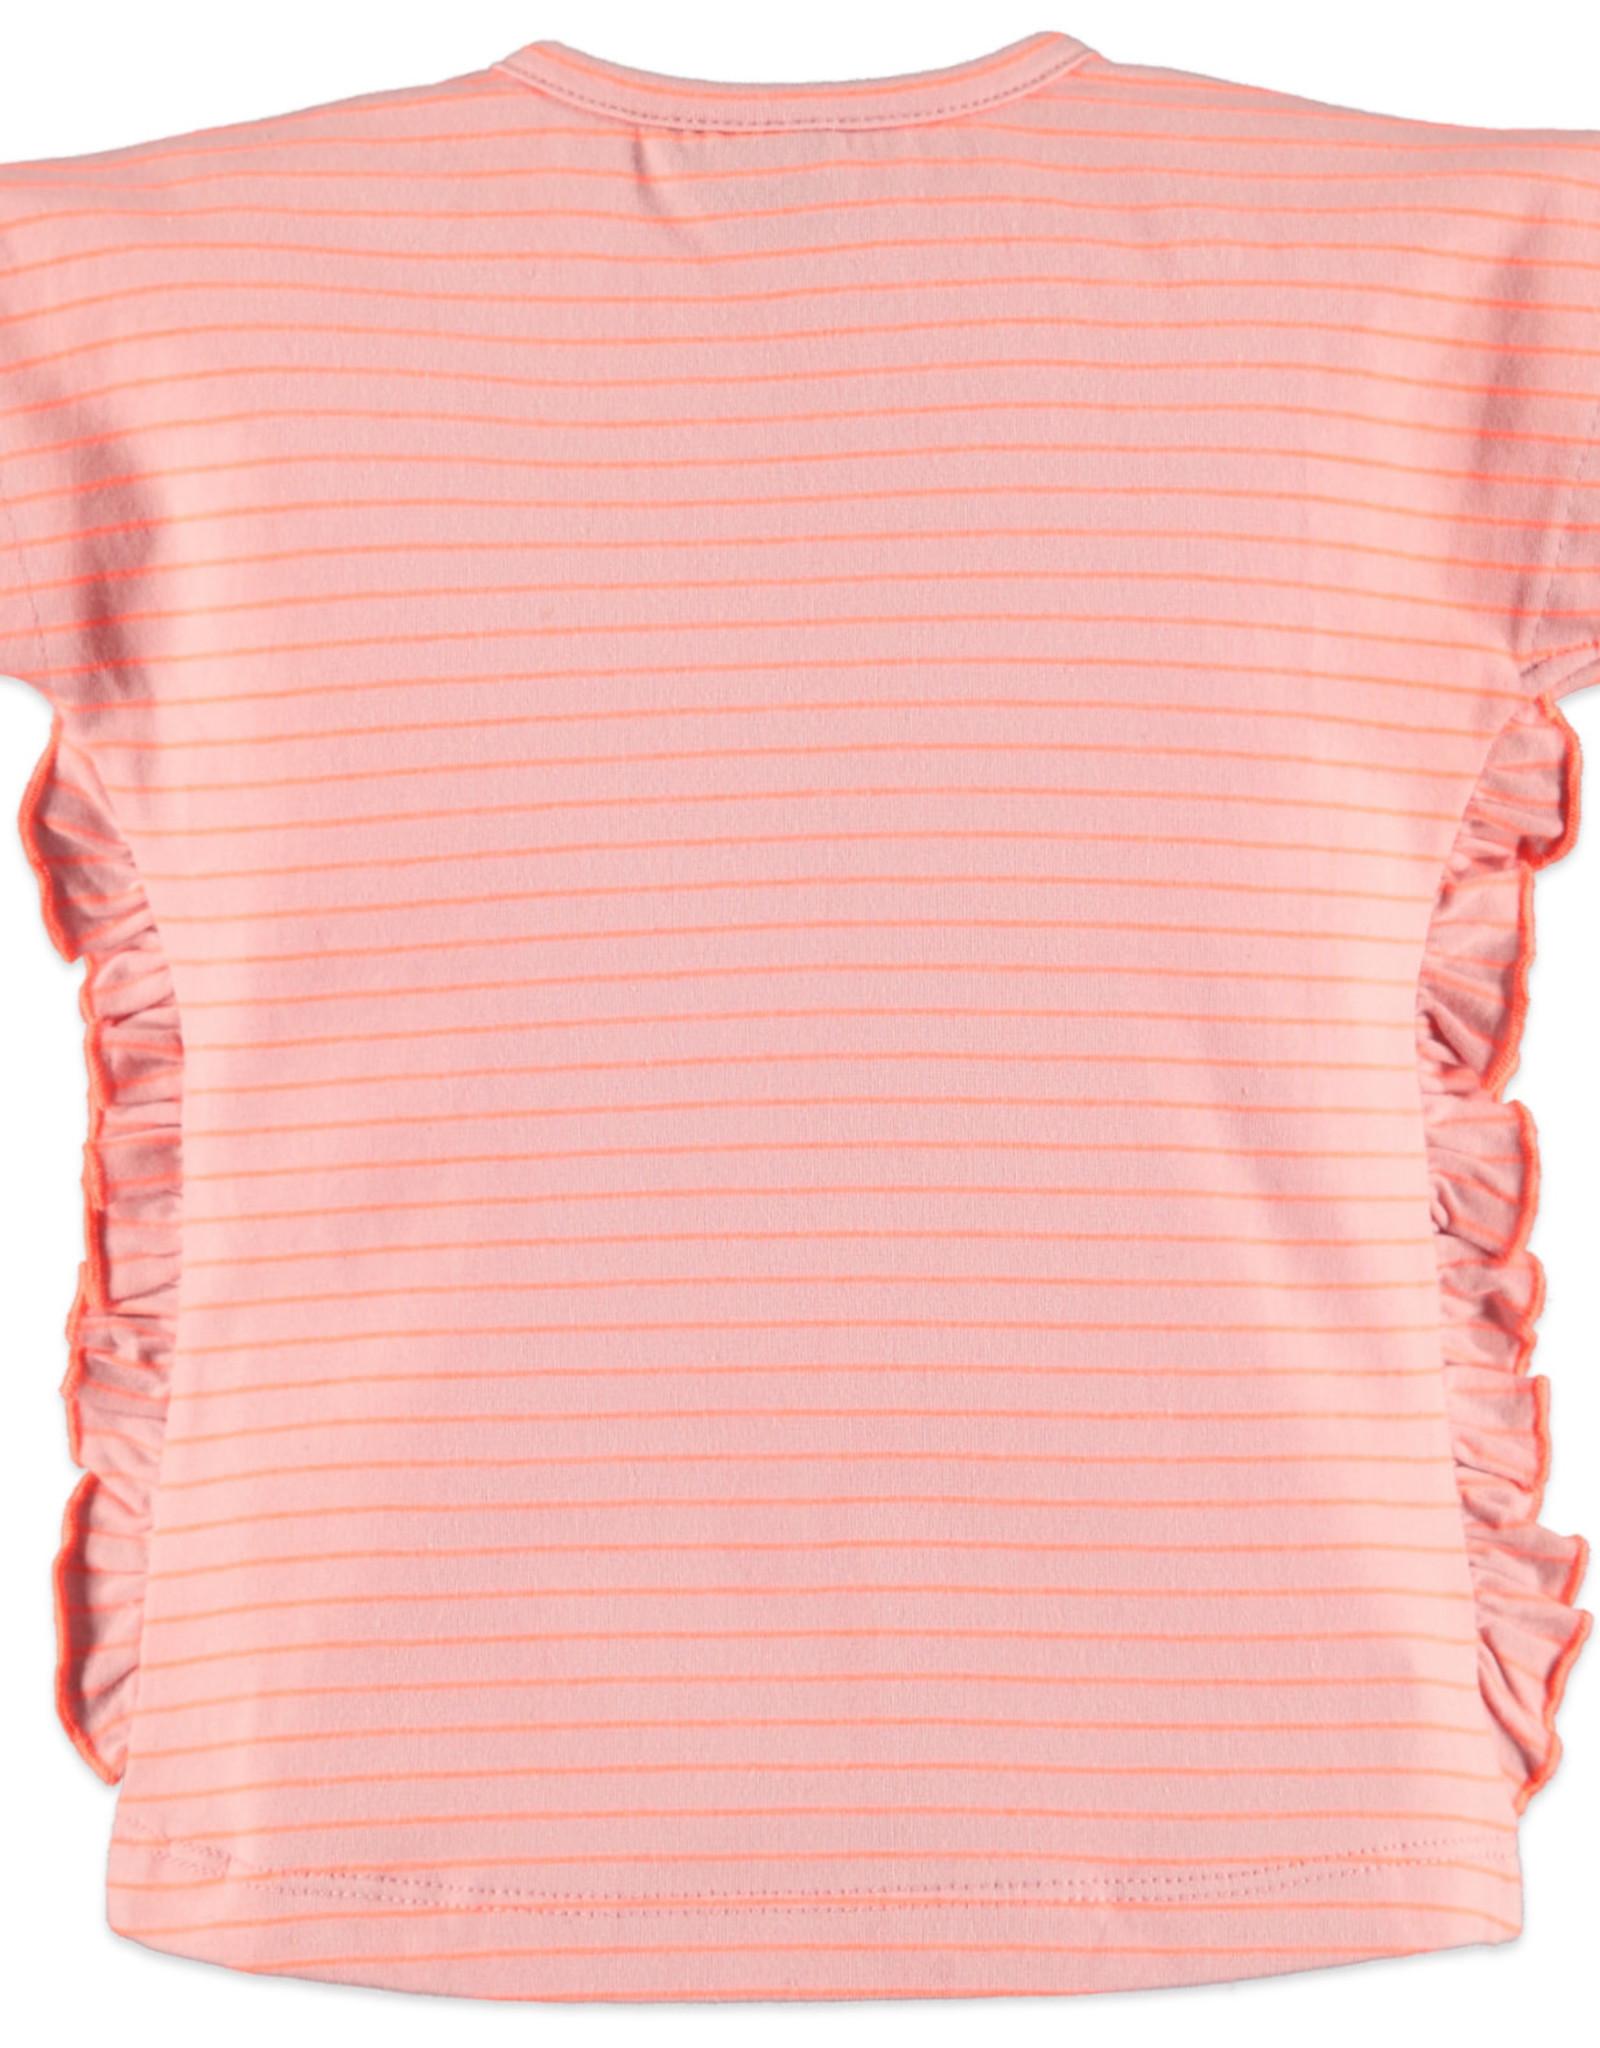 Babyface ruffle tee- pink stripe